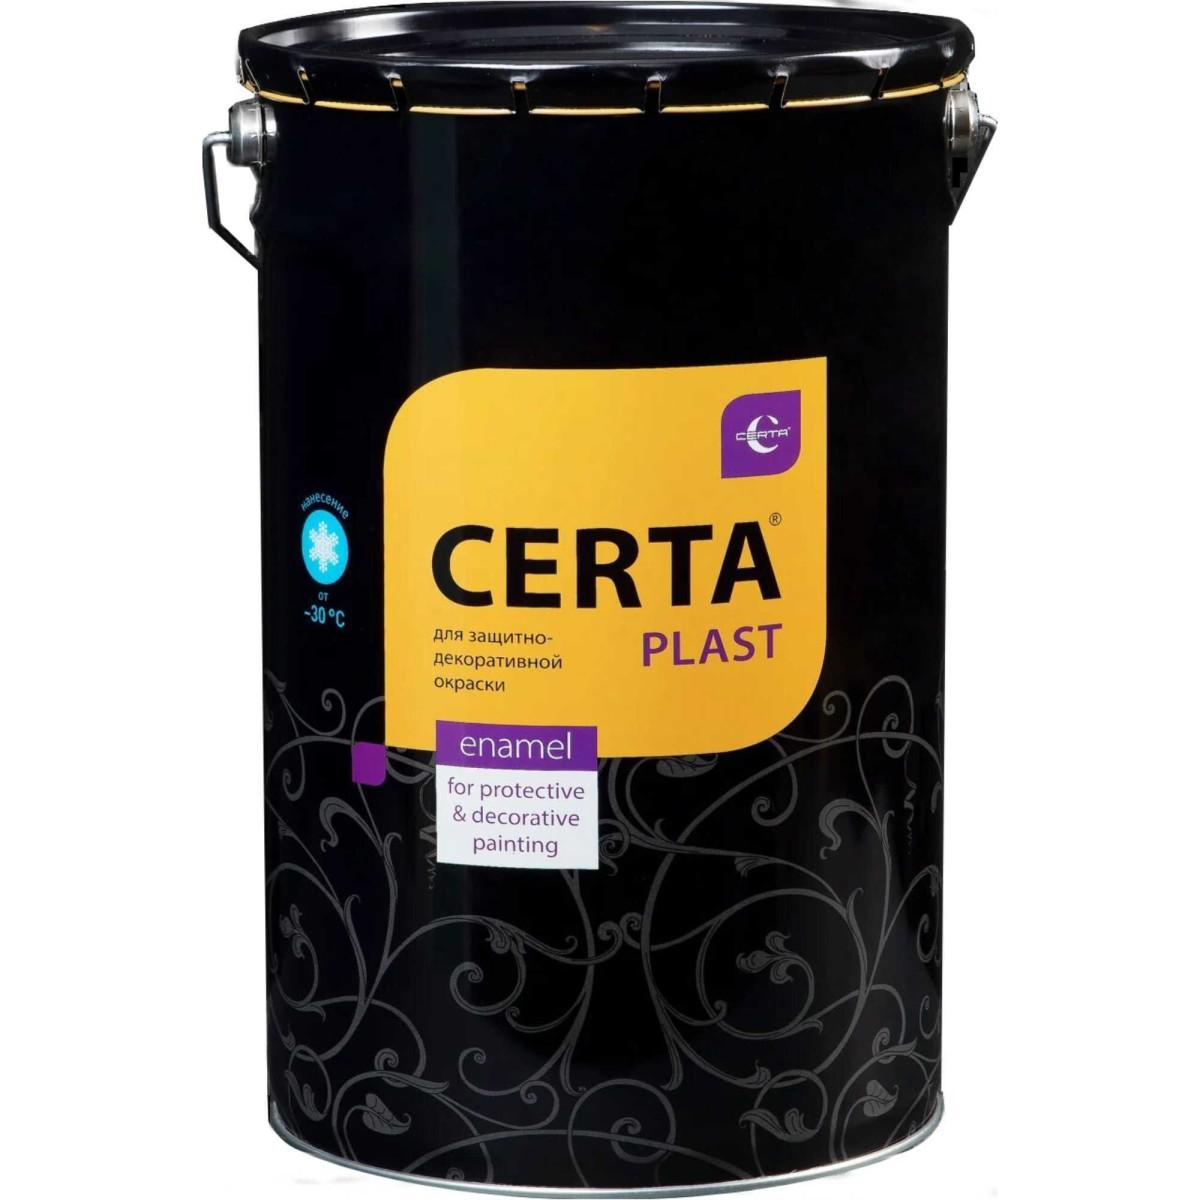 Эмаль Certa Plast полуглянцевая цвет тёмный шоколад 20 л